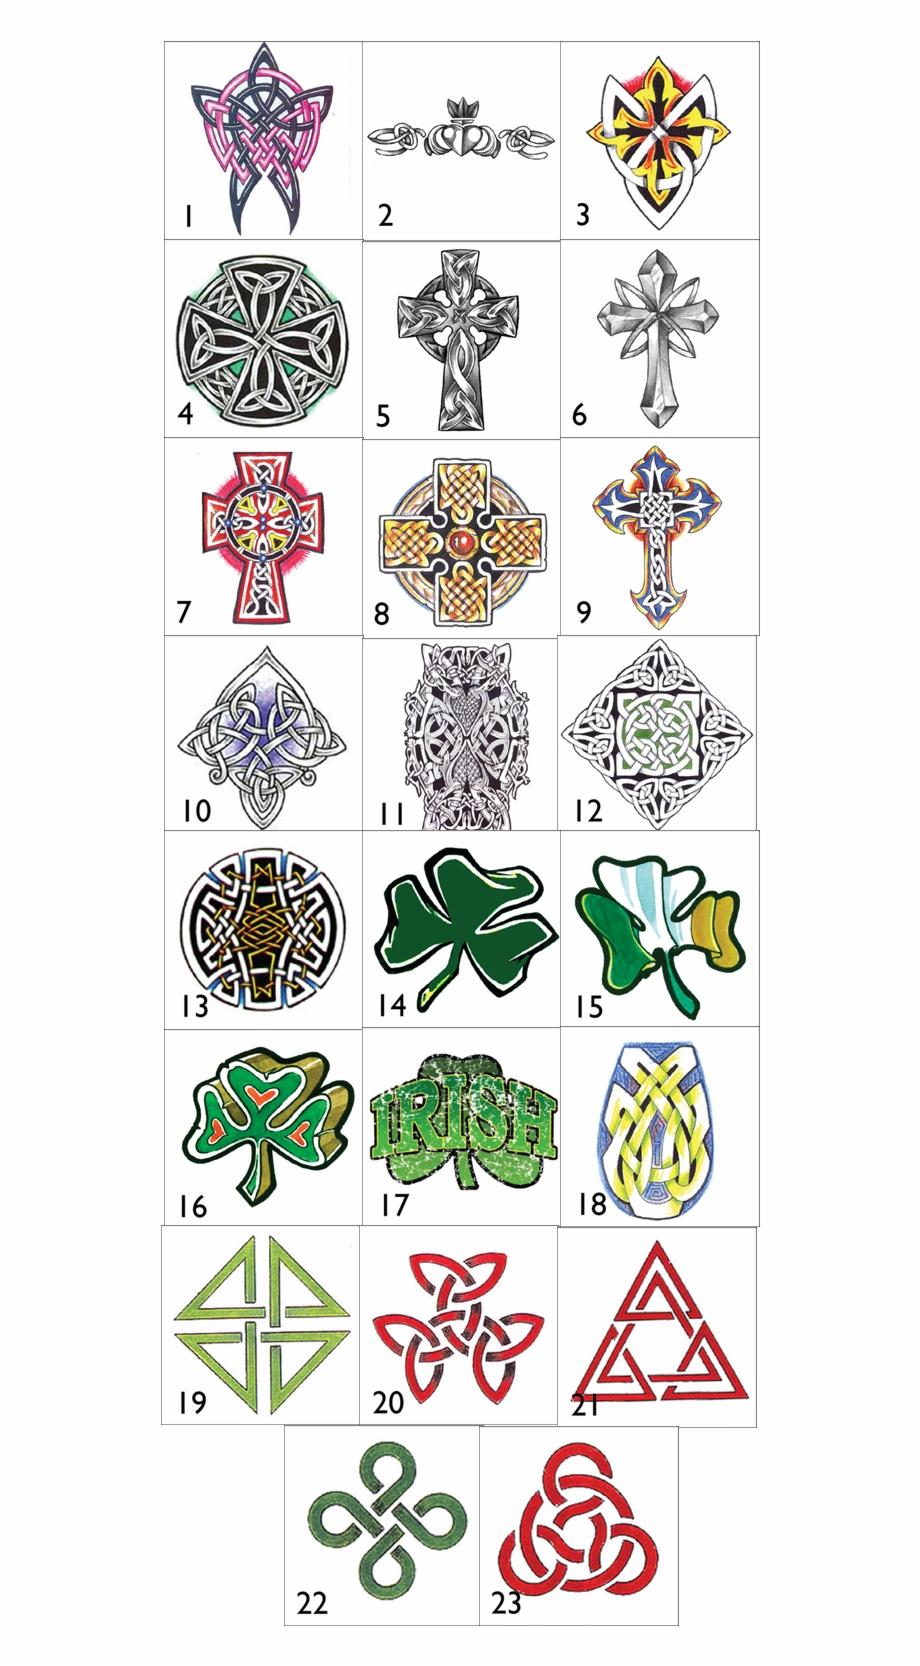 Irish Celtic Symbols And Their Meanings Irish Celtic ...